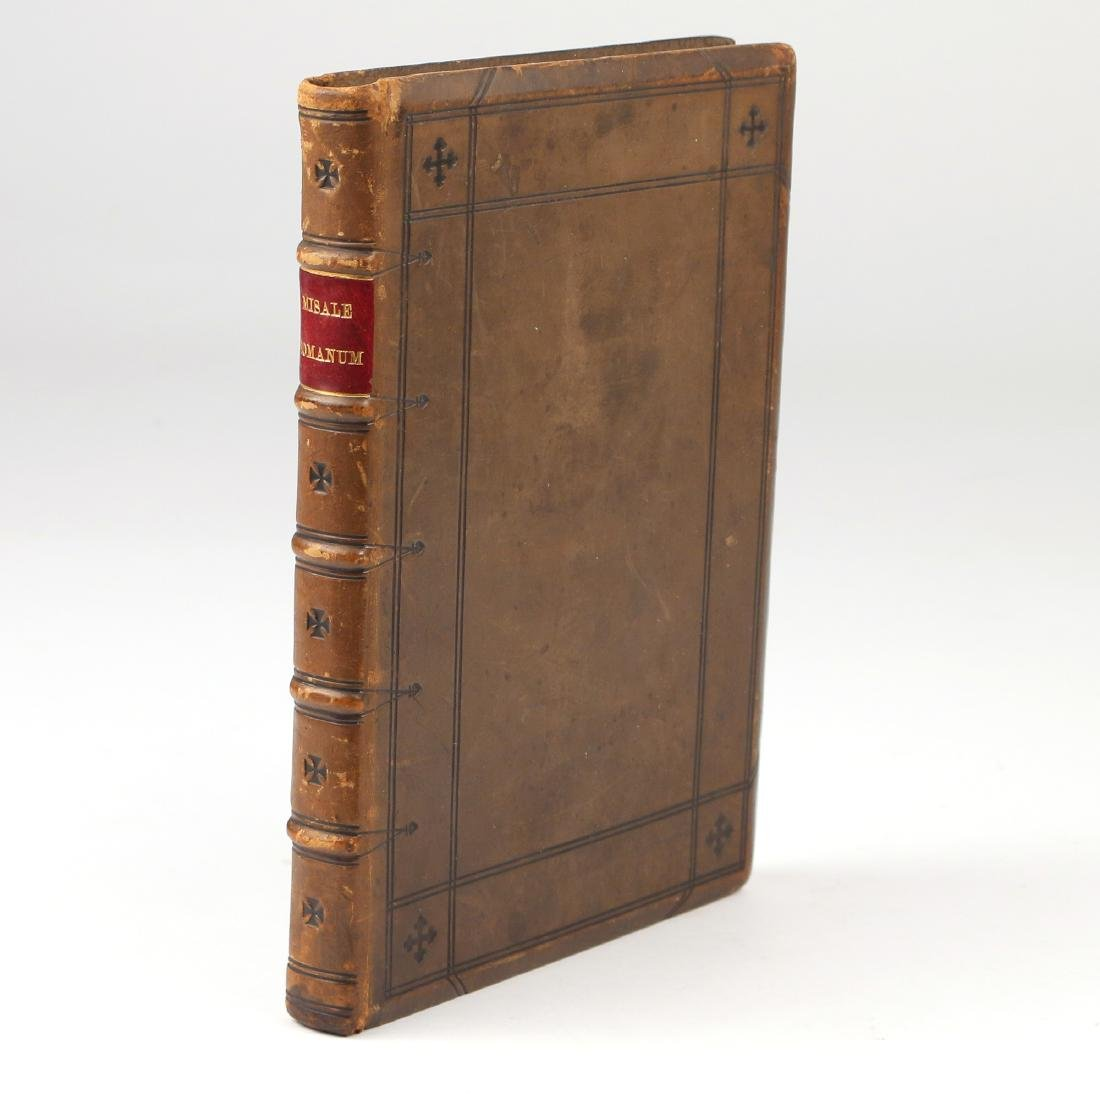 MISSALE ROMANUM LEATHER BOUND BOOK